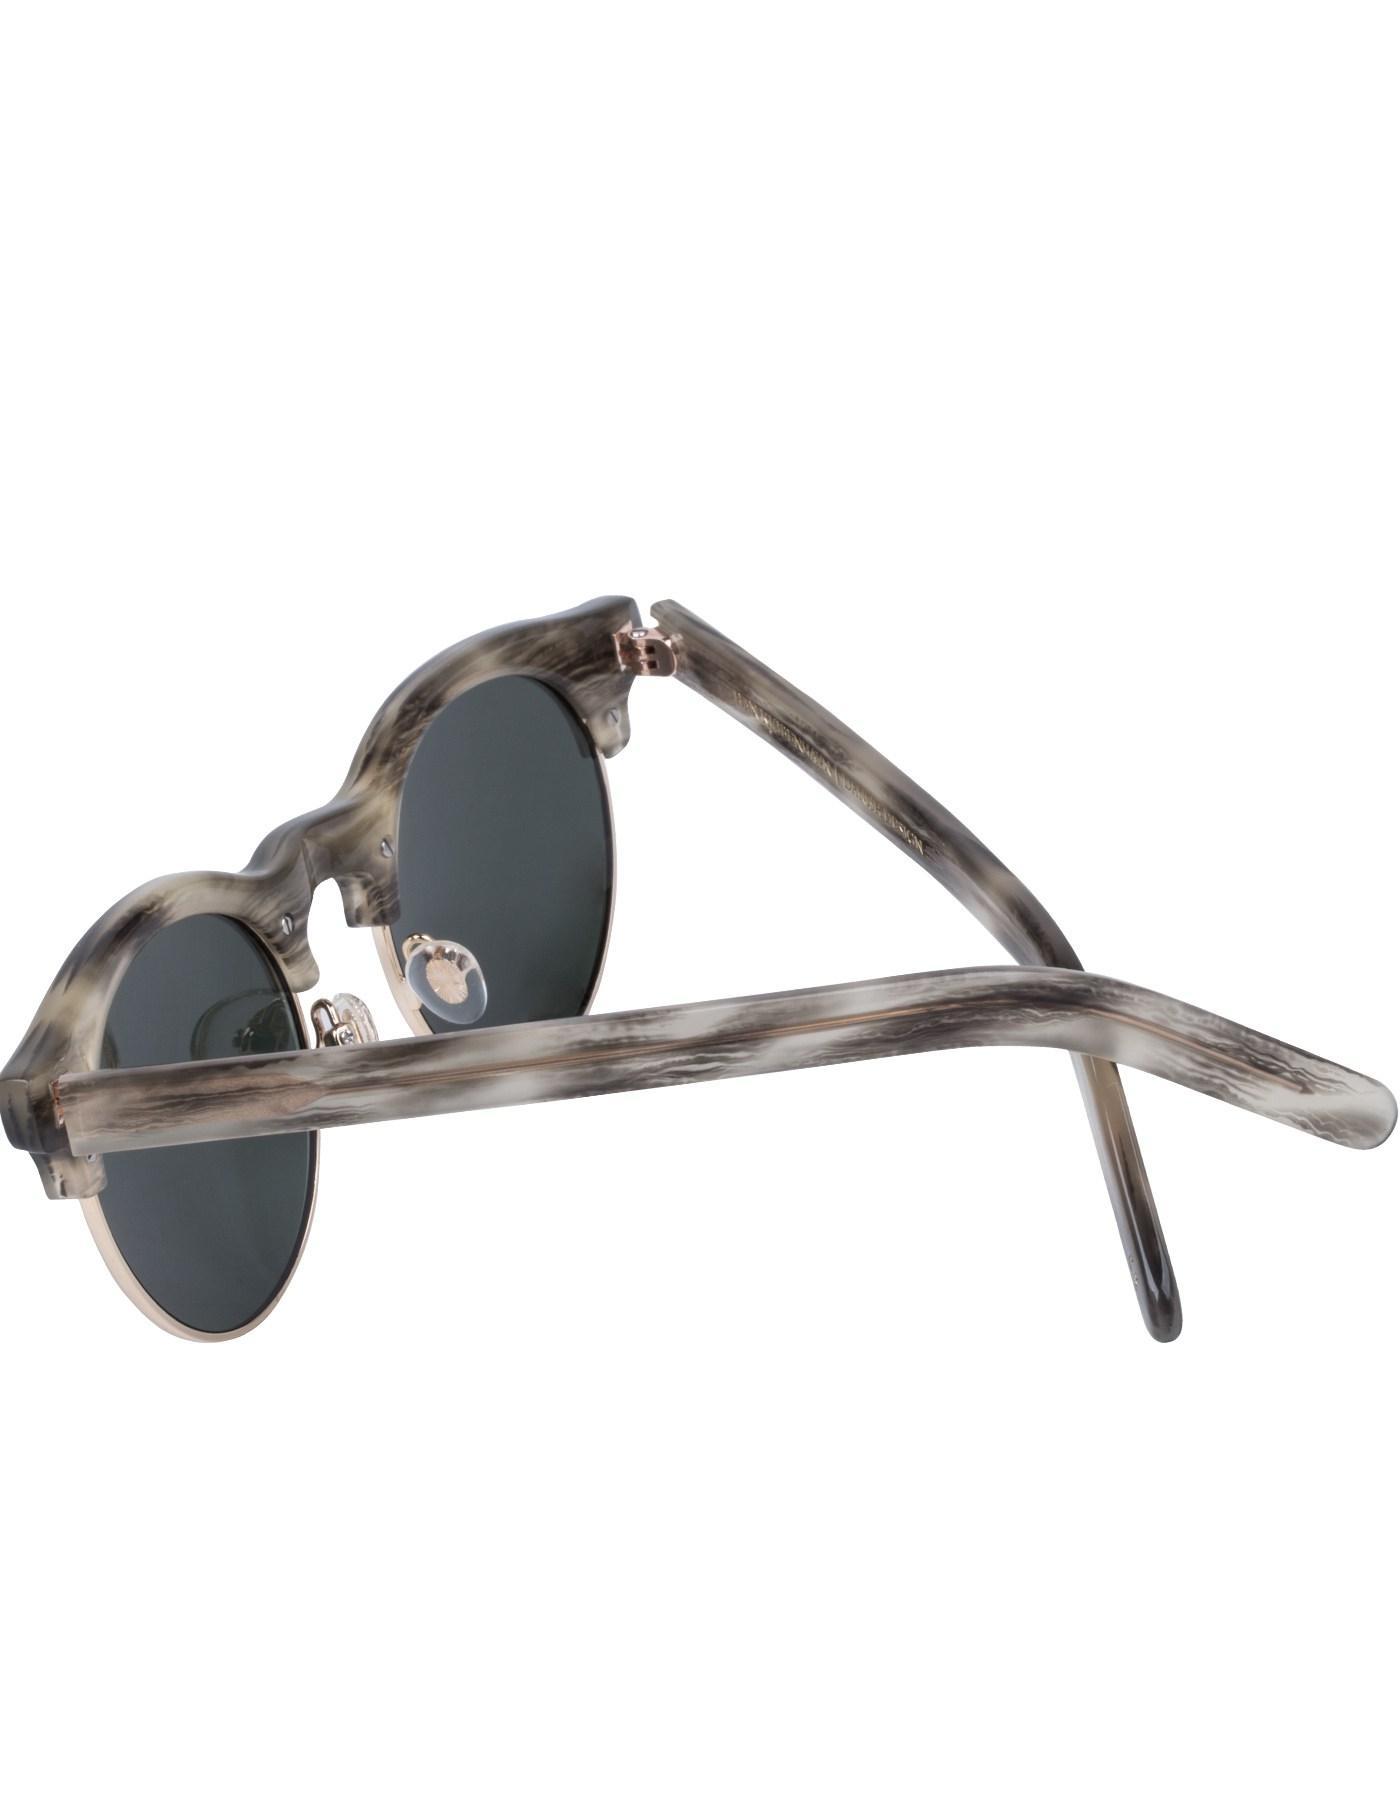 catfarer sunglasses #10